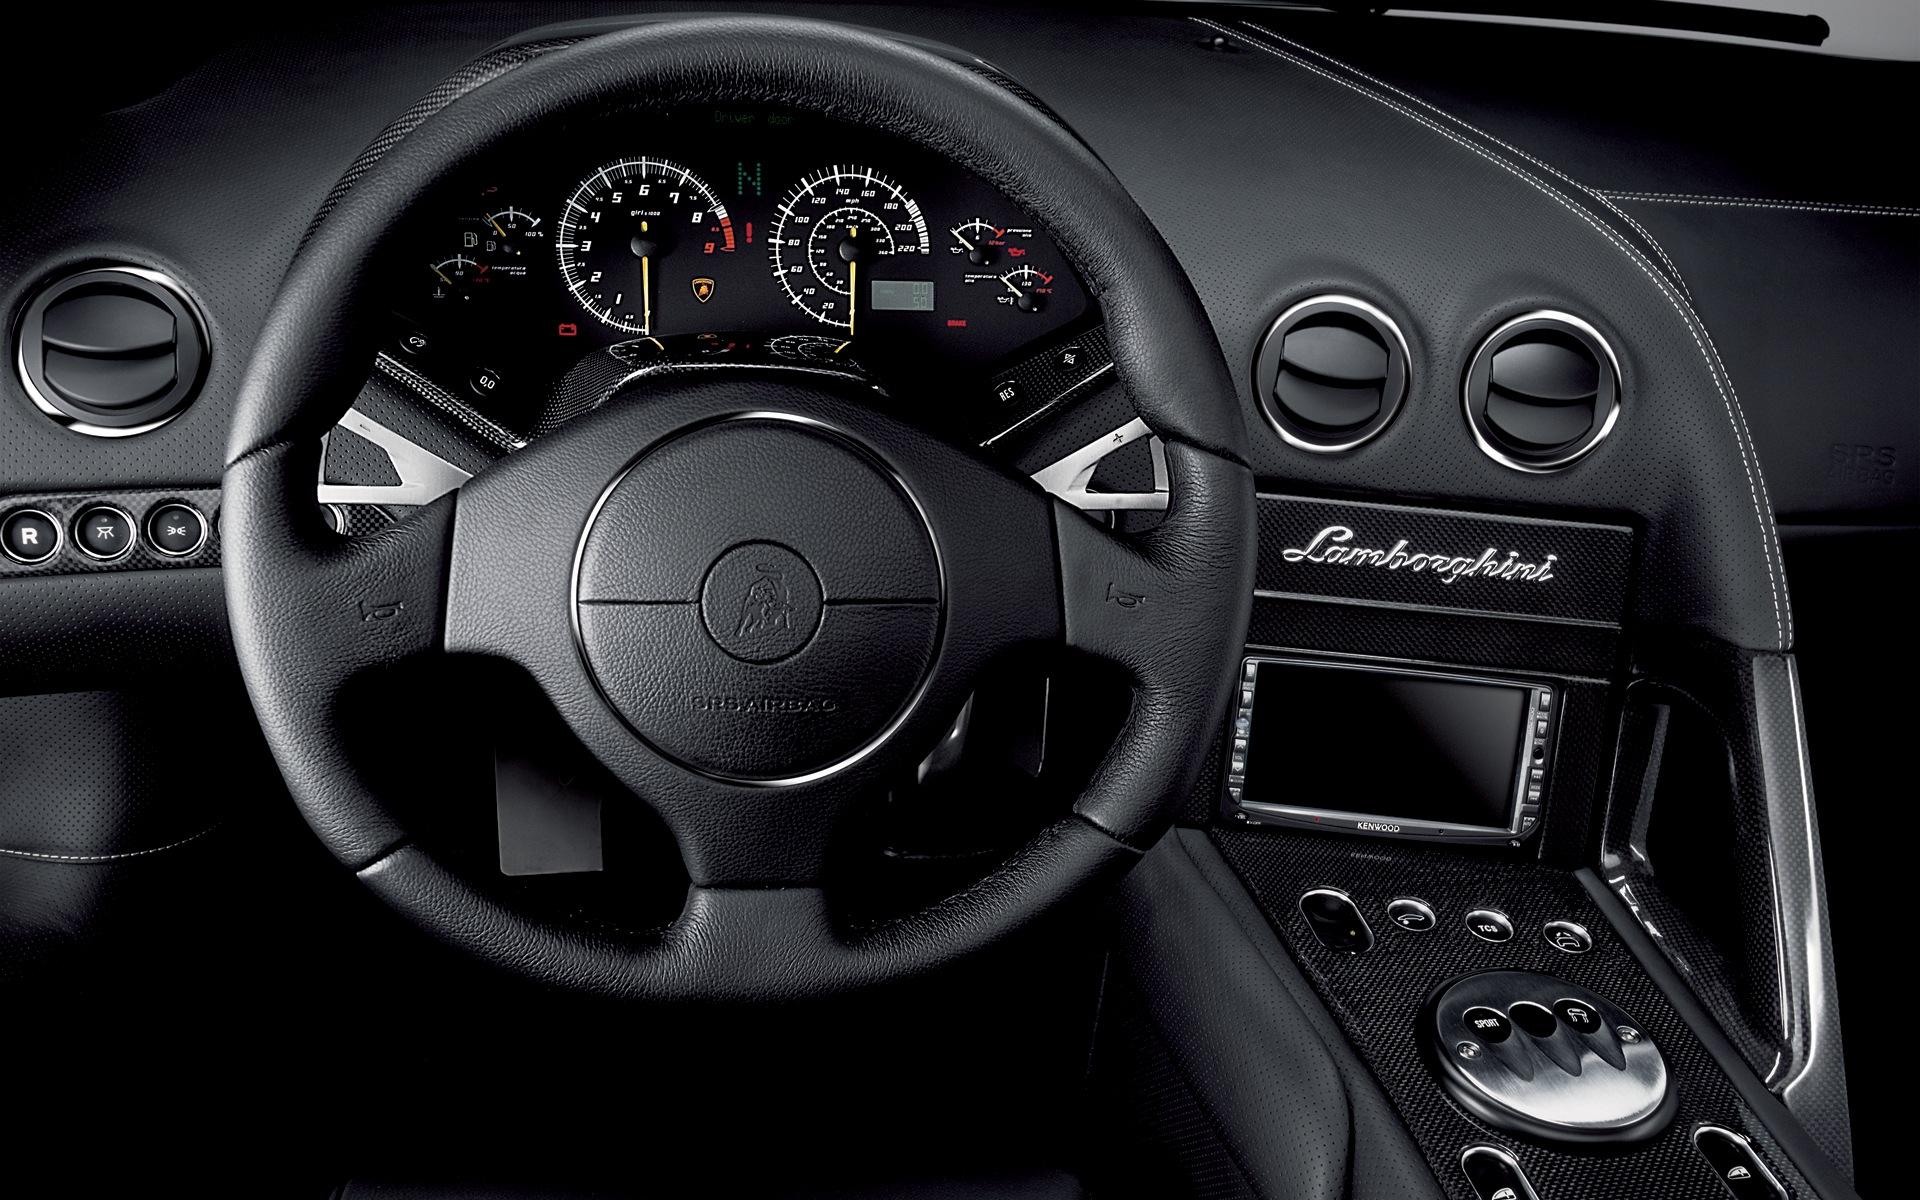 Lamborghini Murcielago Lp640 Roadster Interior Hd Wallpaper